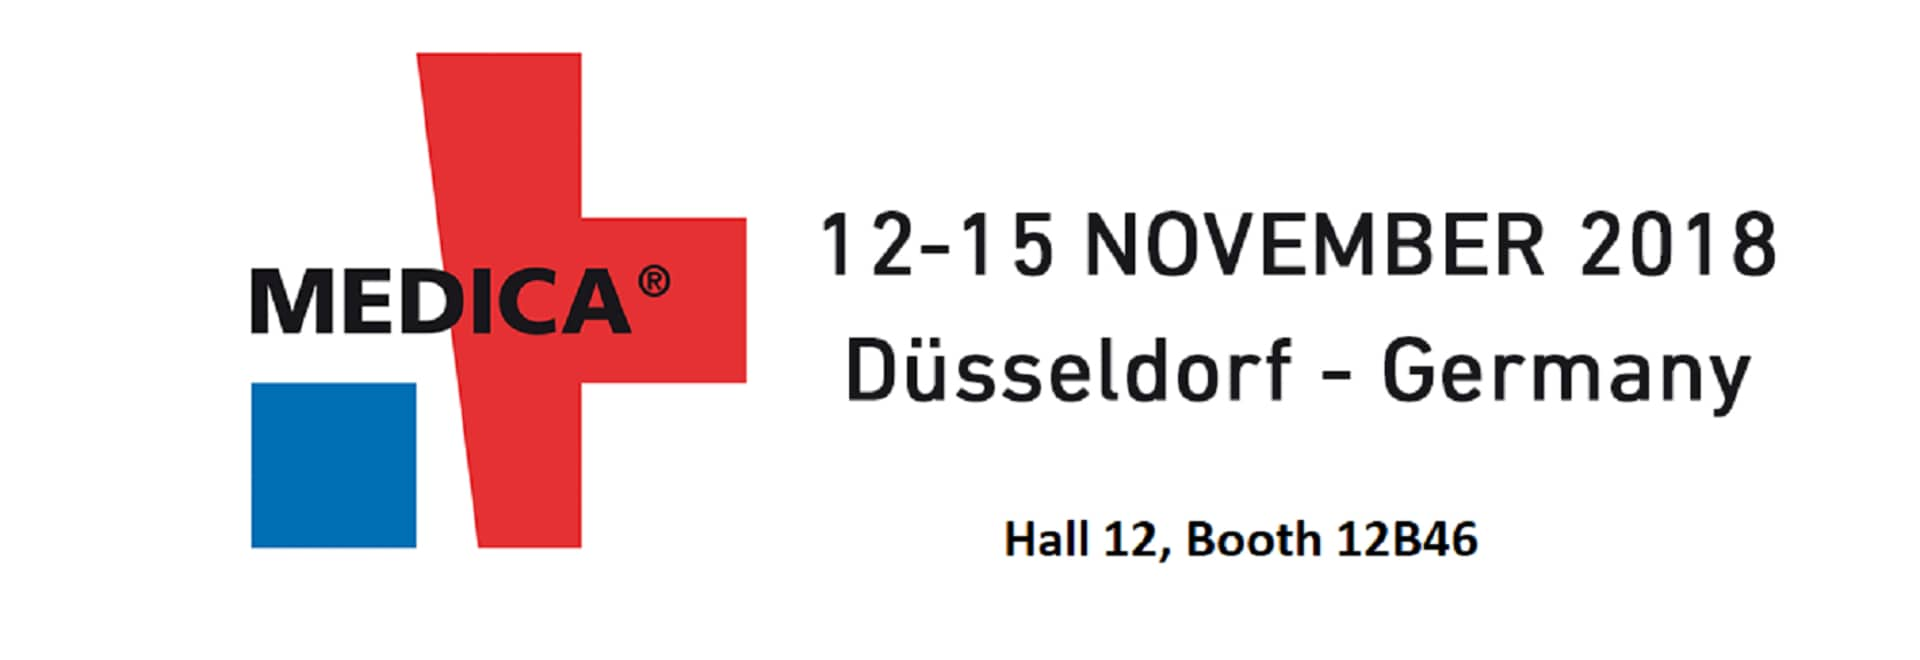 12 – 15 November – MEDICA 2018 DÜSSELDORF